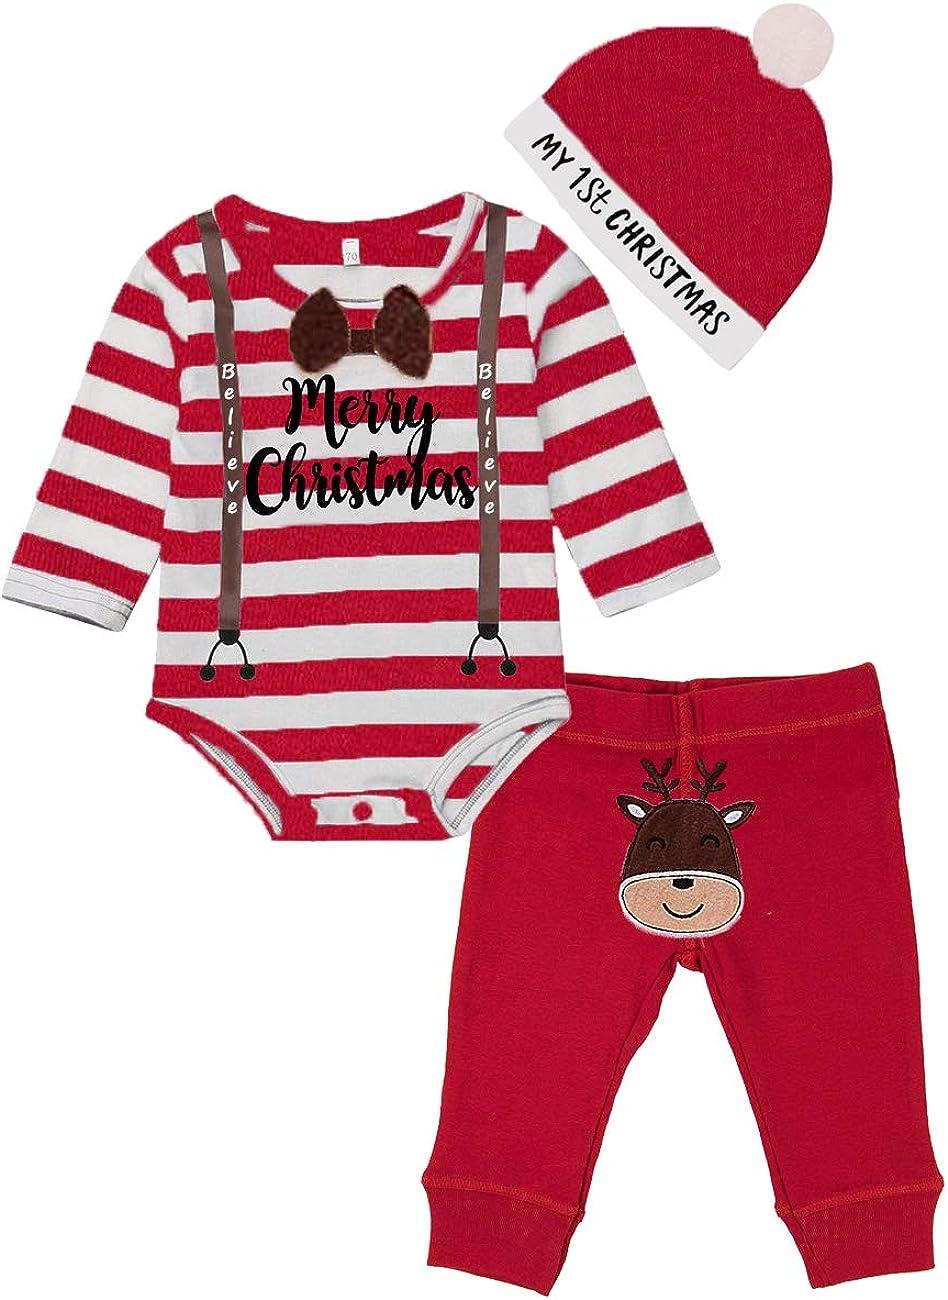 Newborn Baby Boy Girl Christmas Outfit Letter Print Romper Bodysuit+Plaid Pants+Headband 3Pcs Infant Christmas Pajamas Set